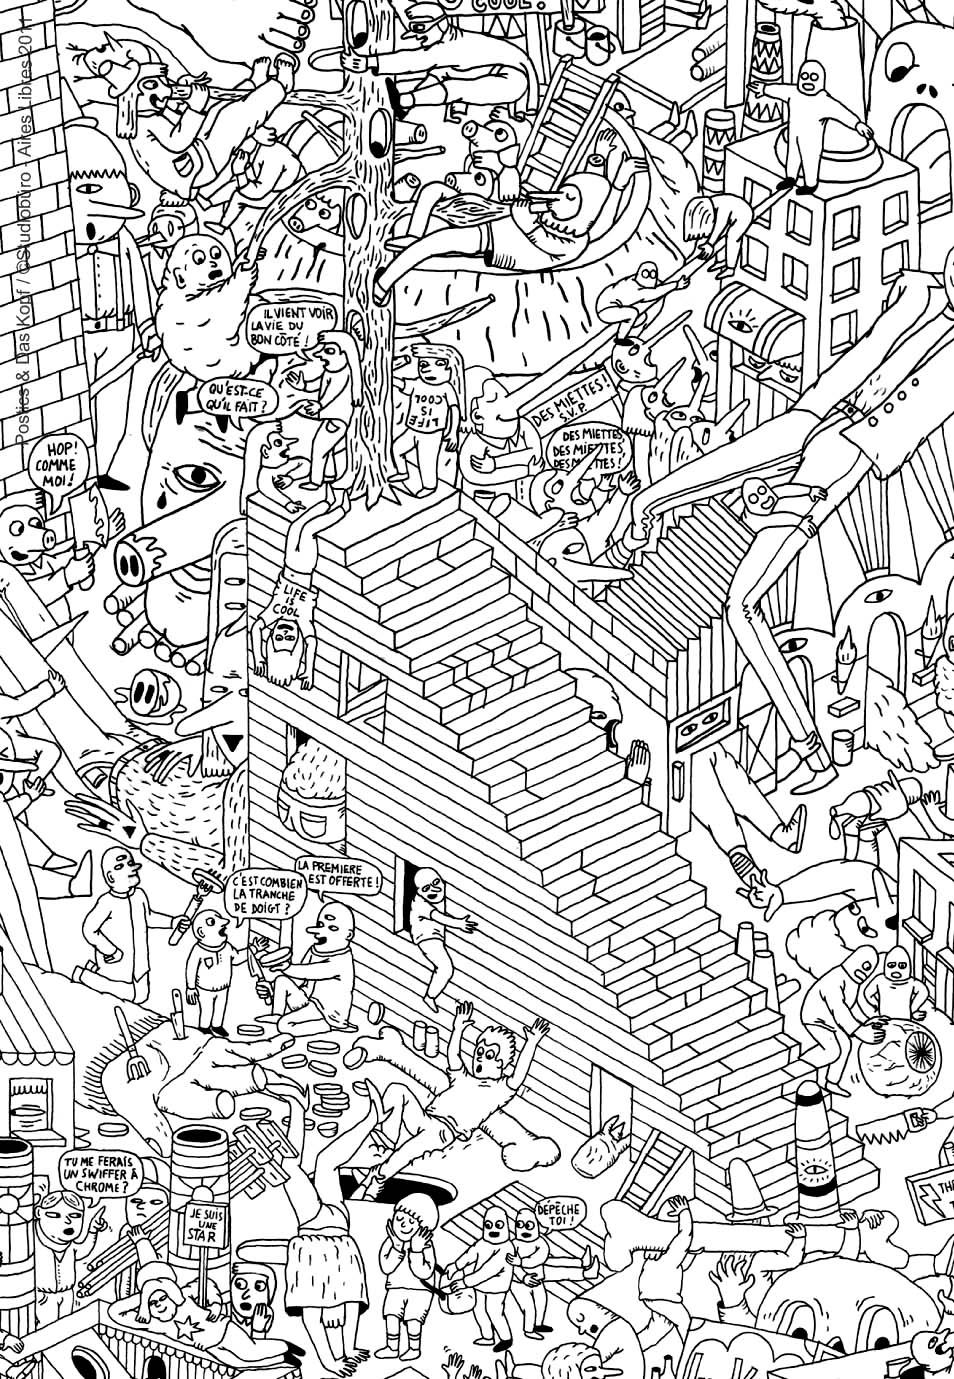 Disegni da colorare per adulti : Doodle art / Doodling - 8